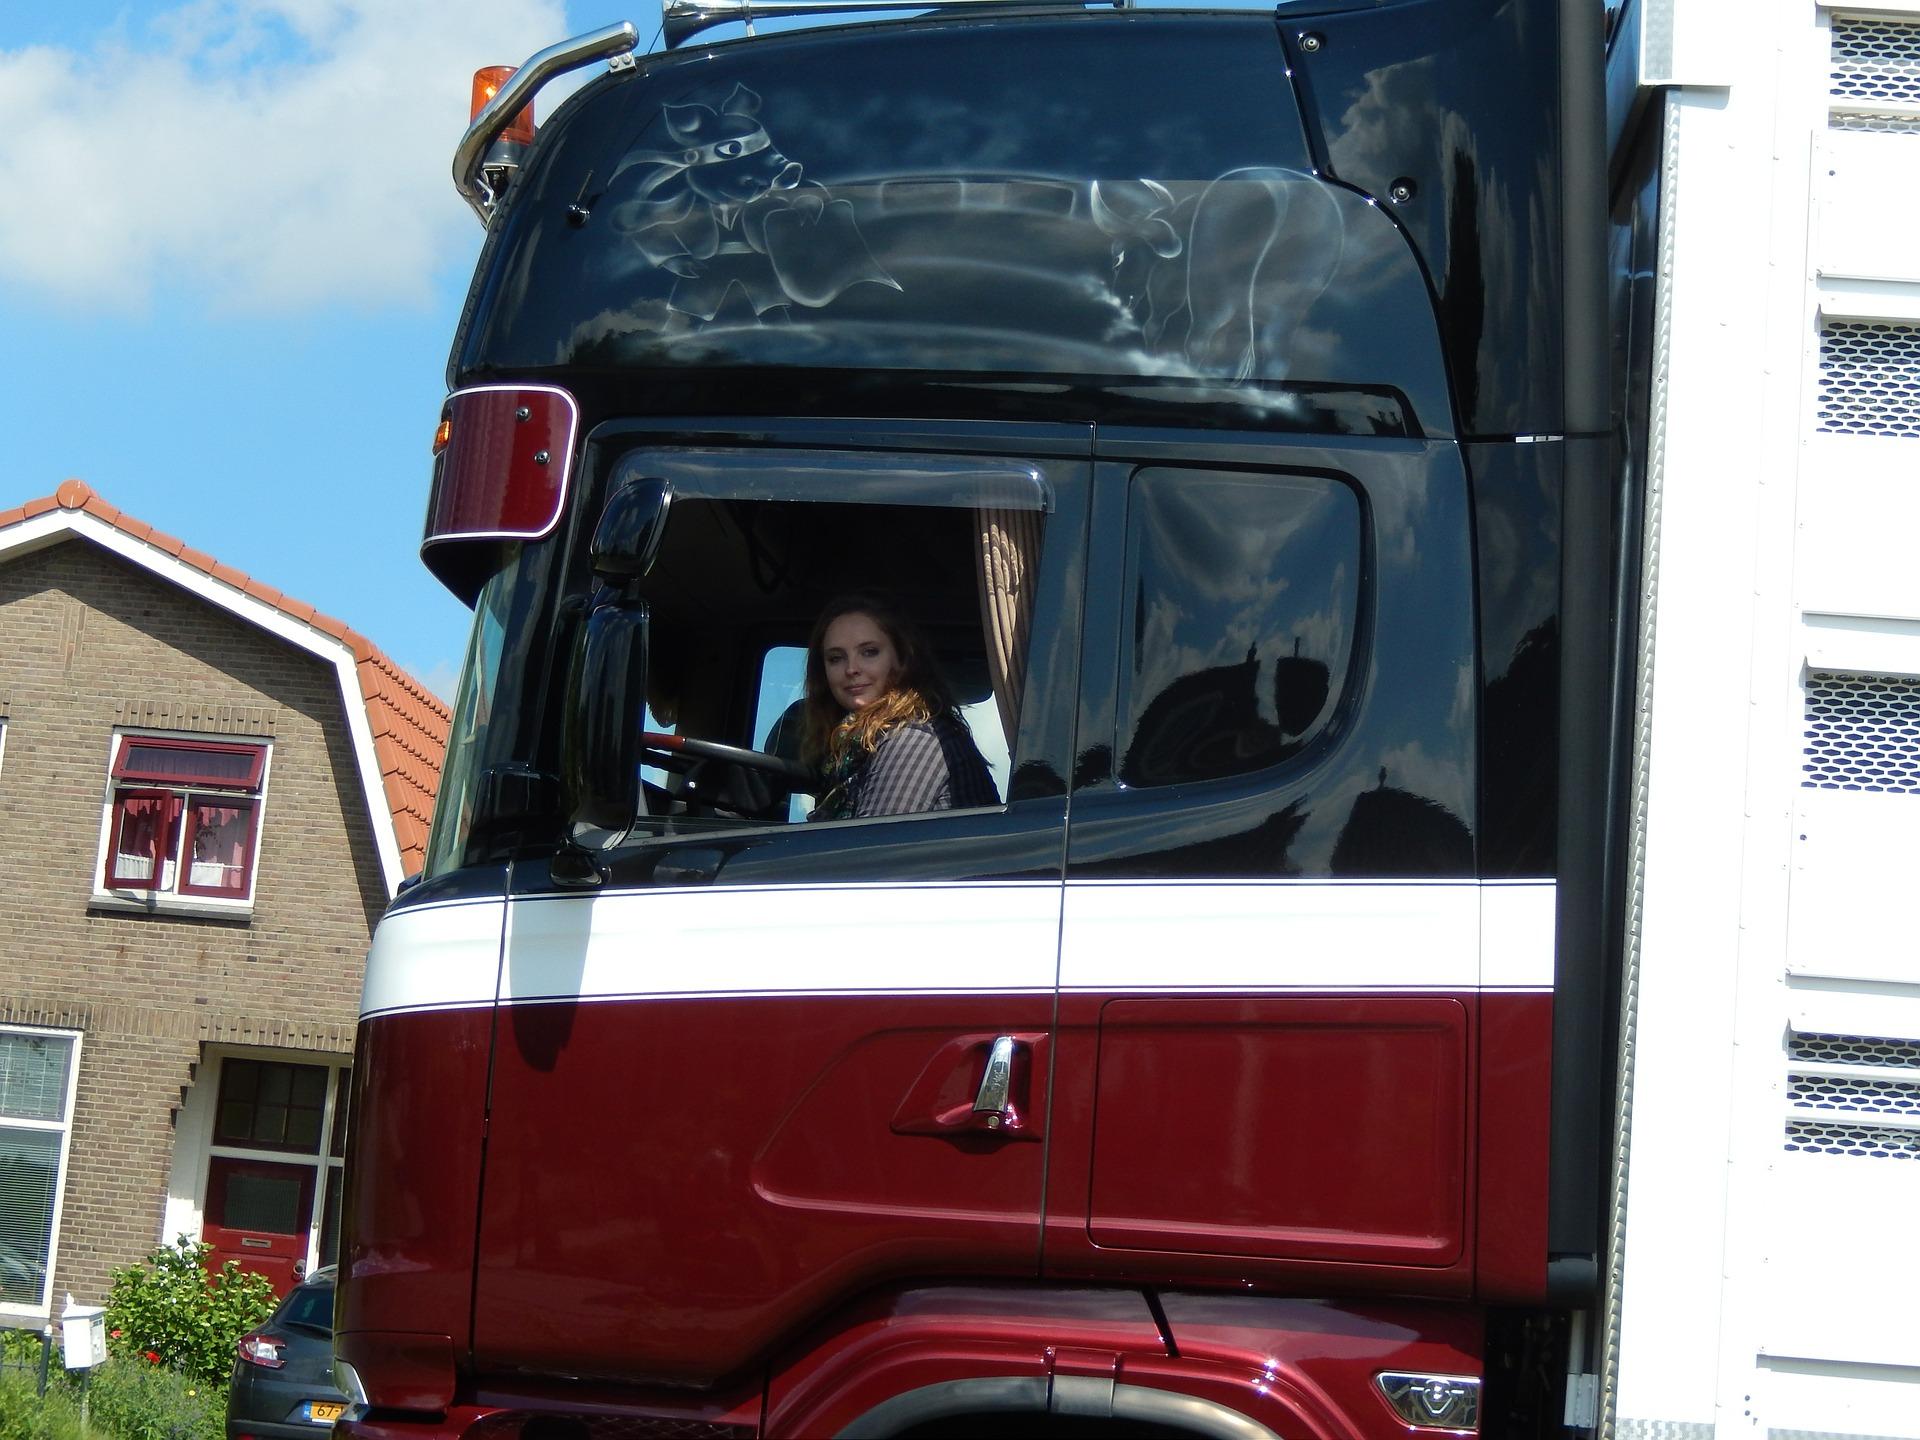 mujer conduce transporte público